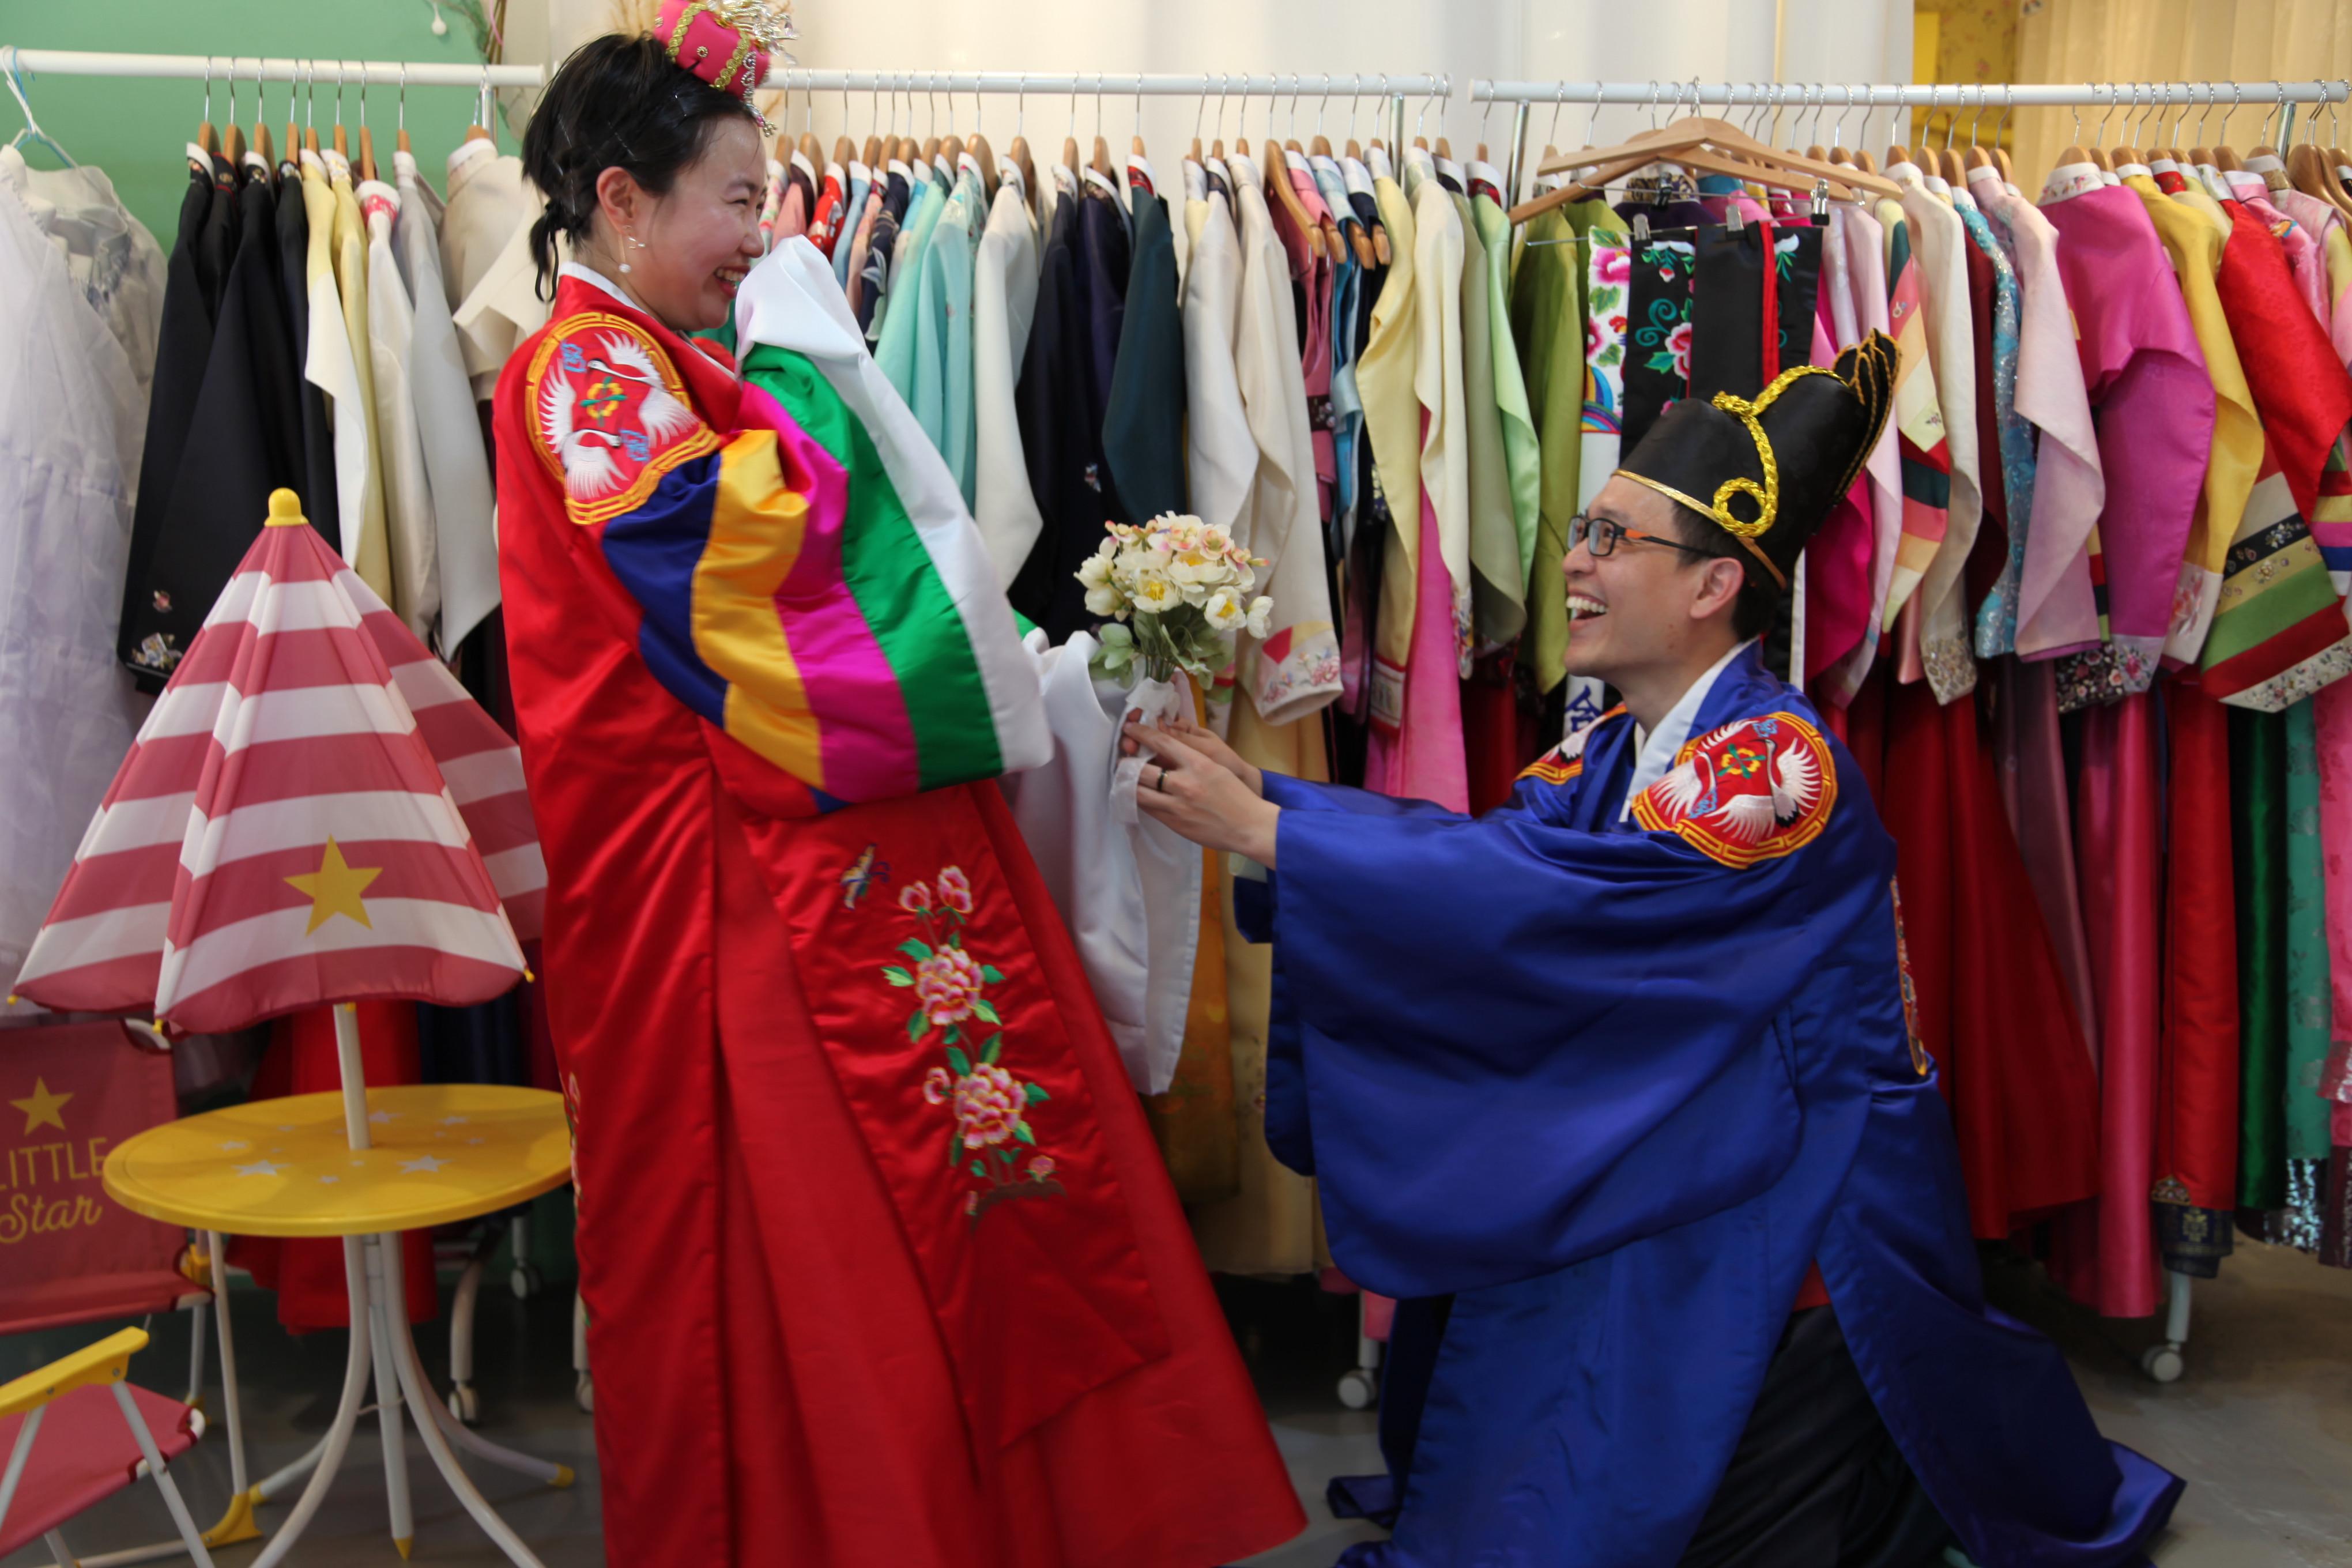 [Adult] Hanbok Rental for 4hrs